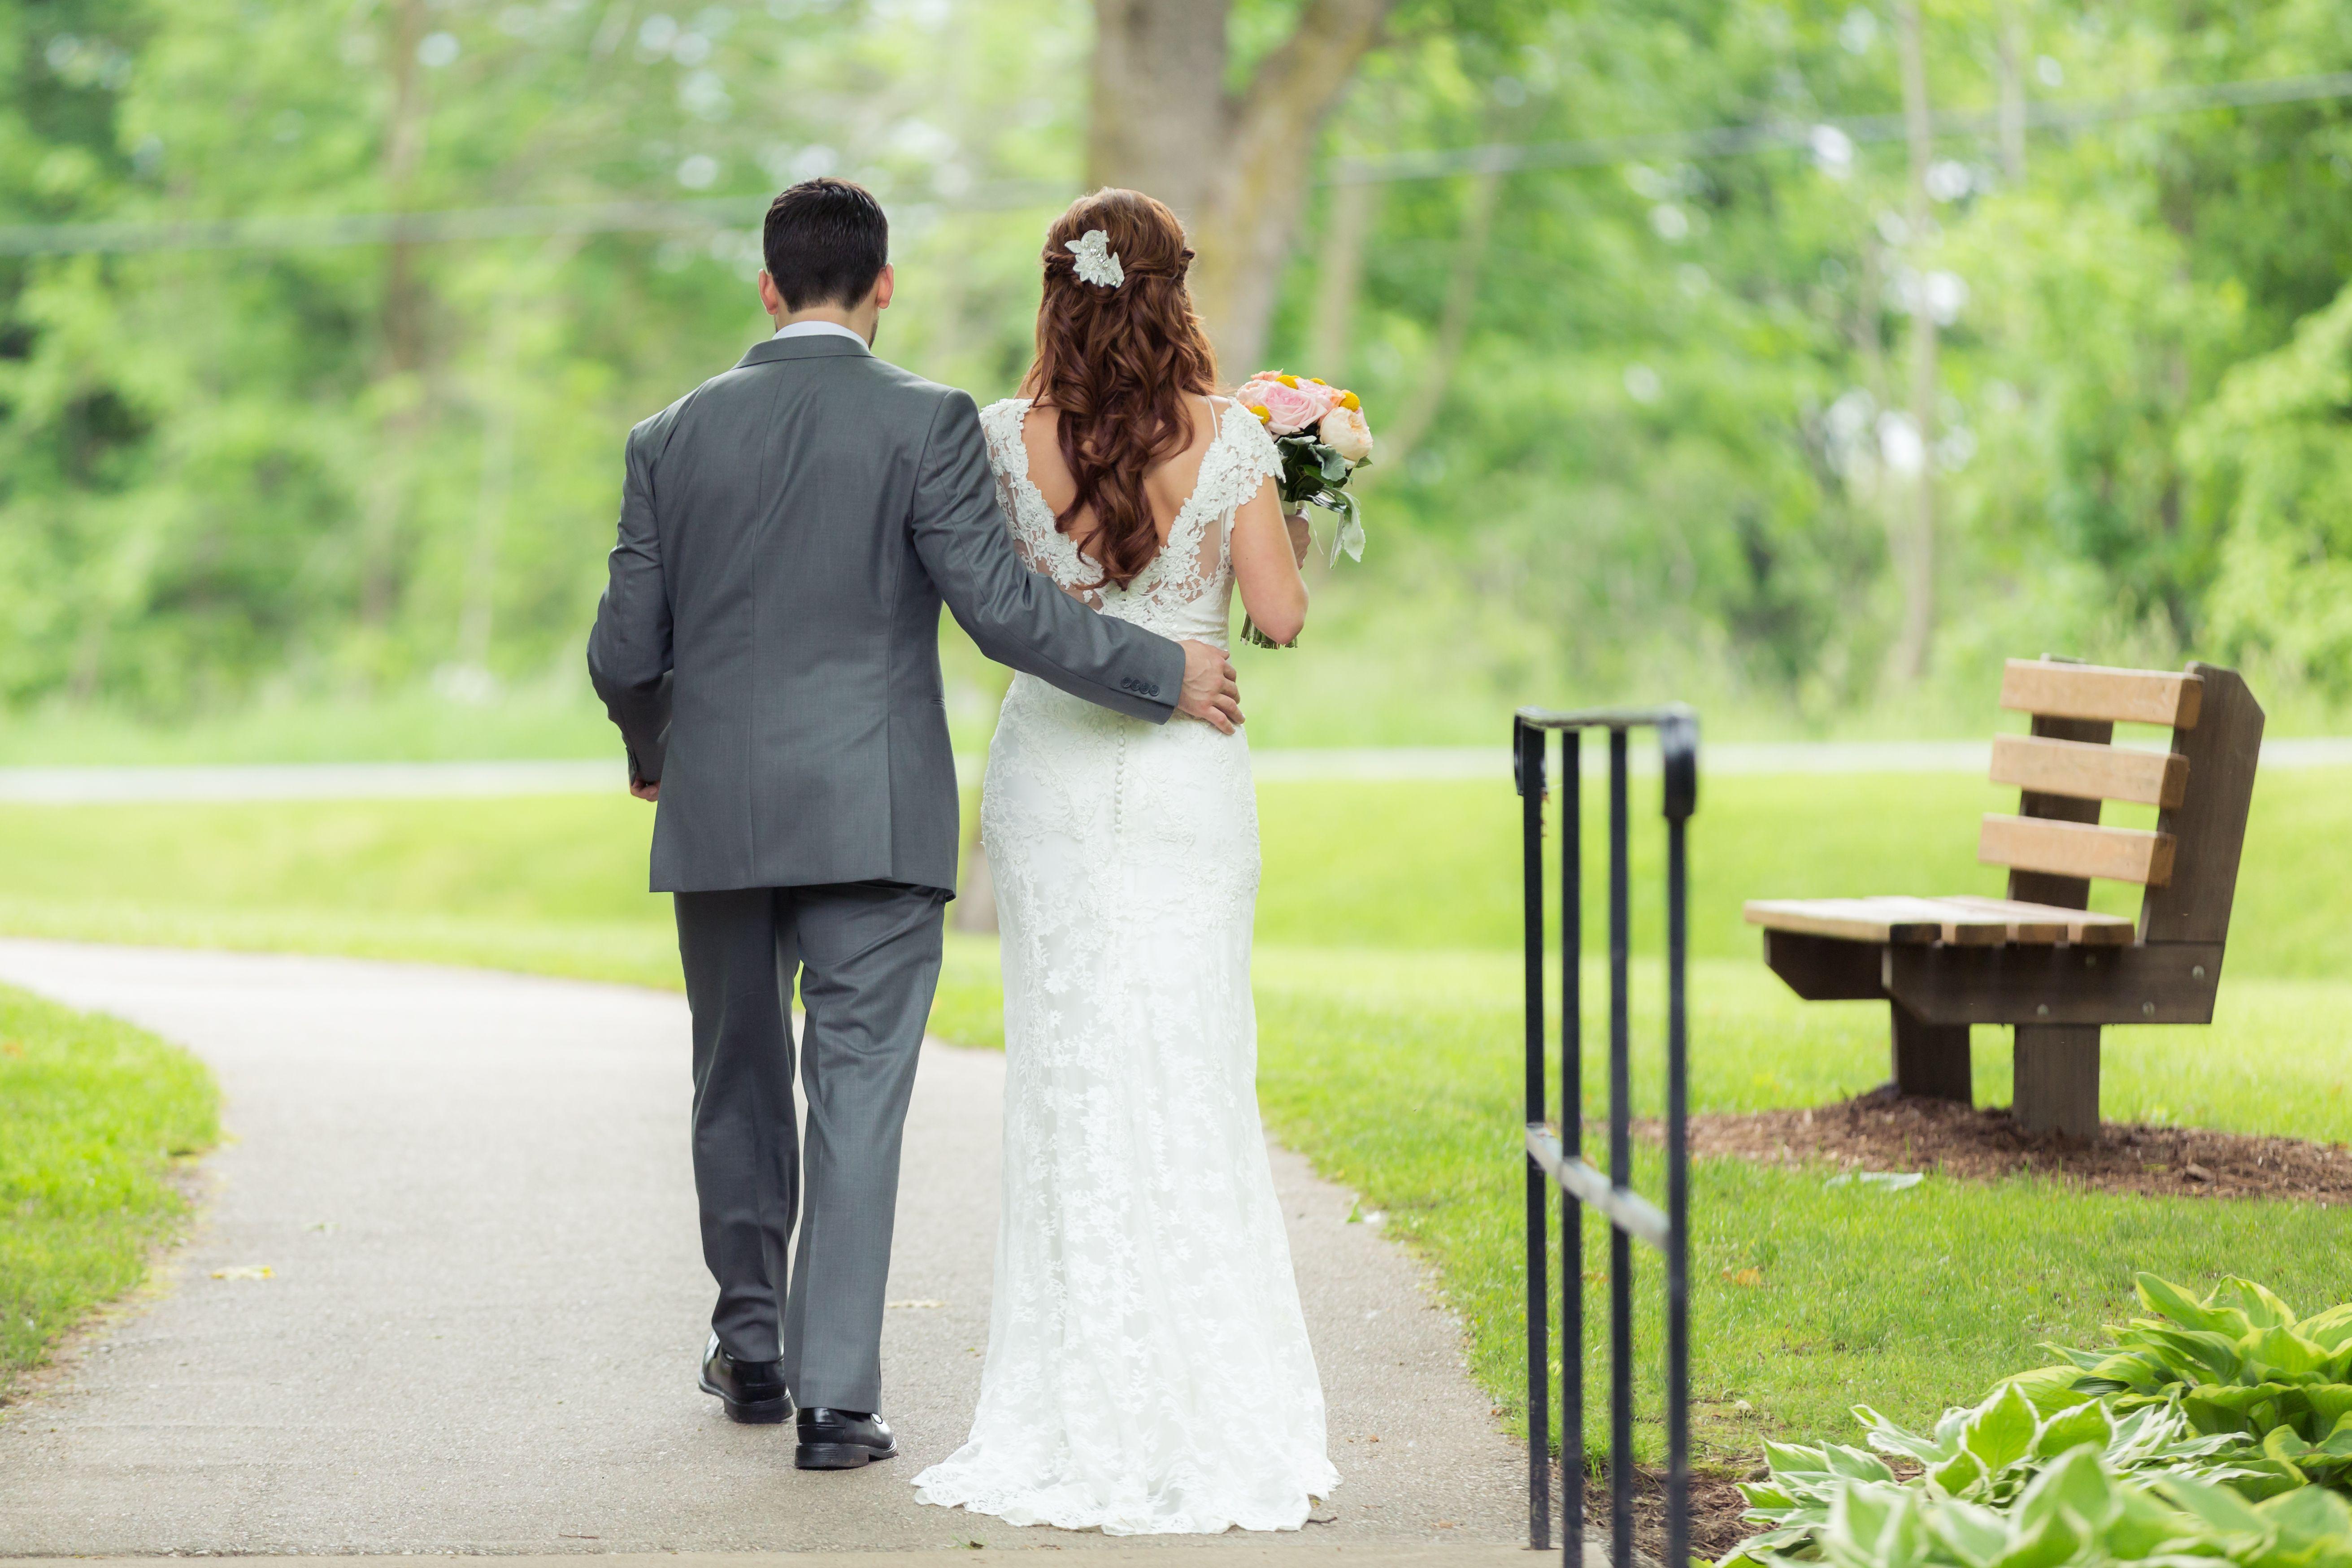 Wedding dress suit  lace wedding dress gray suit  BZ Wedding  Pinterest  Lace wedding